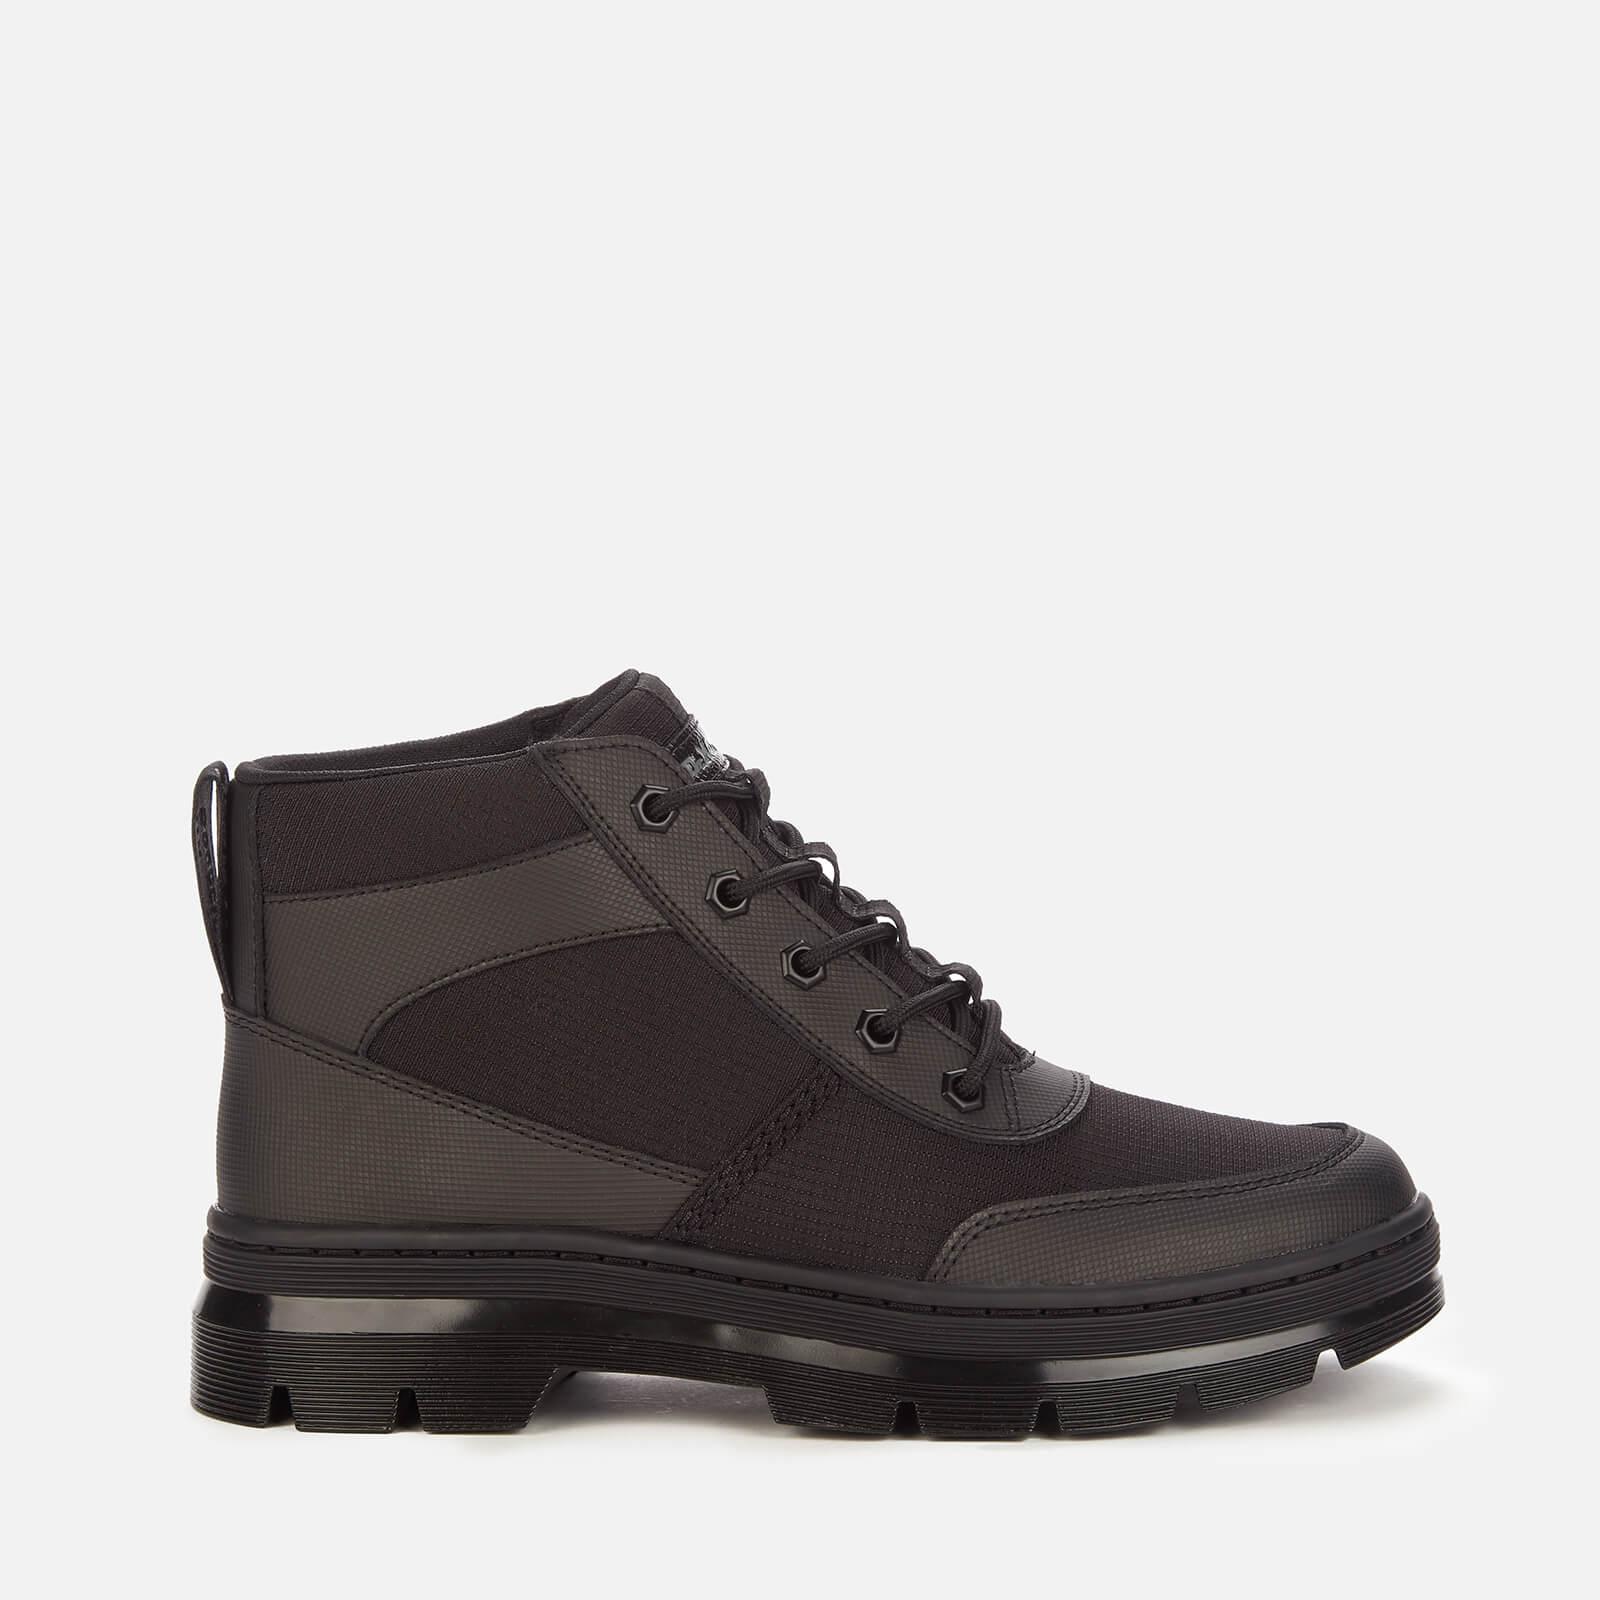 Dr. Martens Bonny Extra Tough Nylon Chukka Boots - Black - UK 5